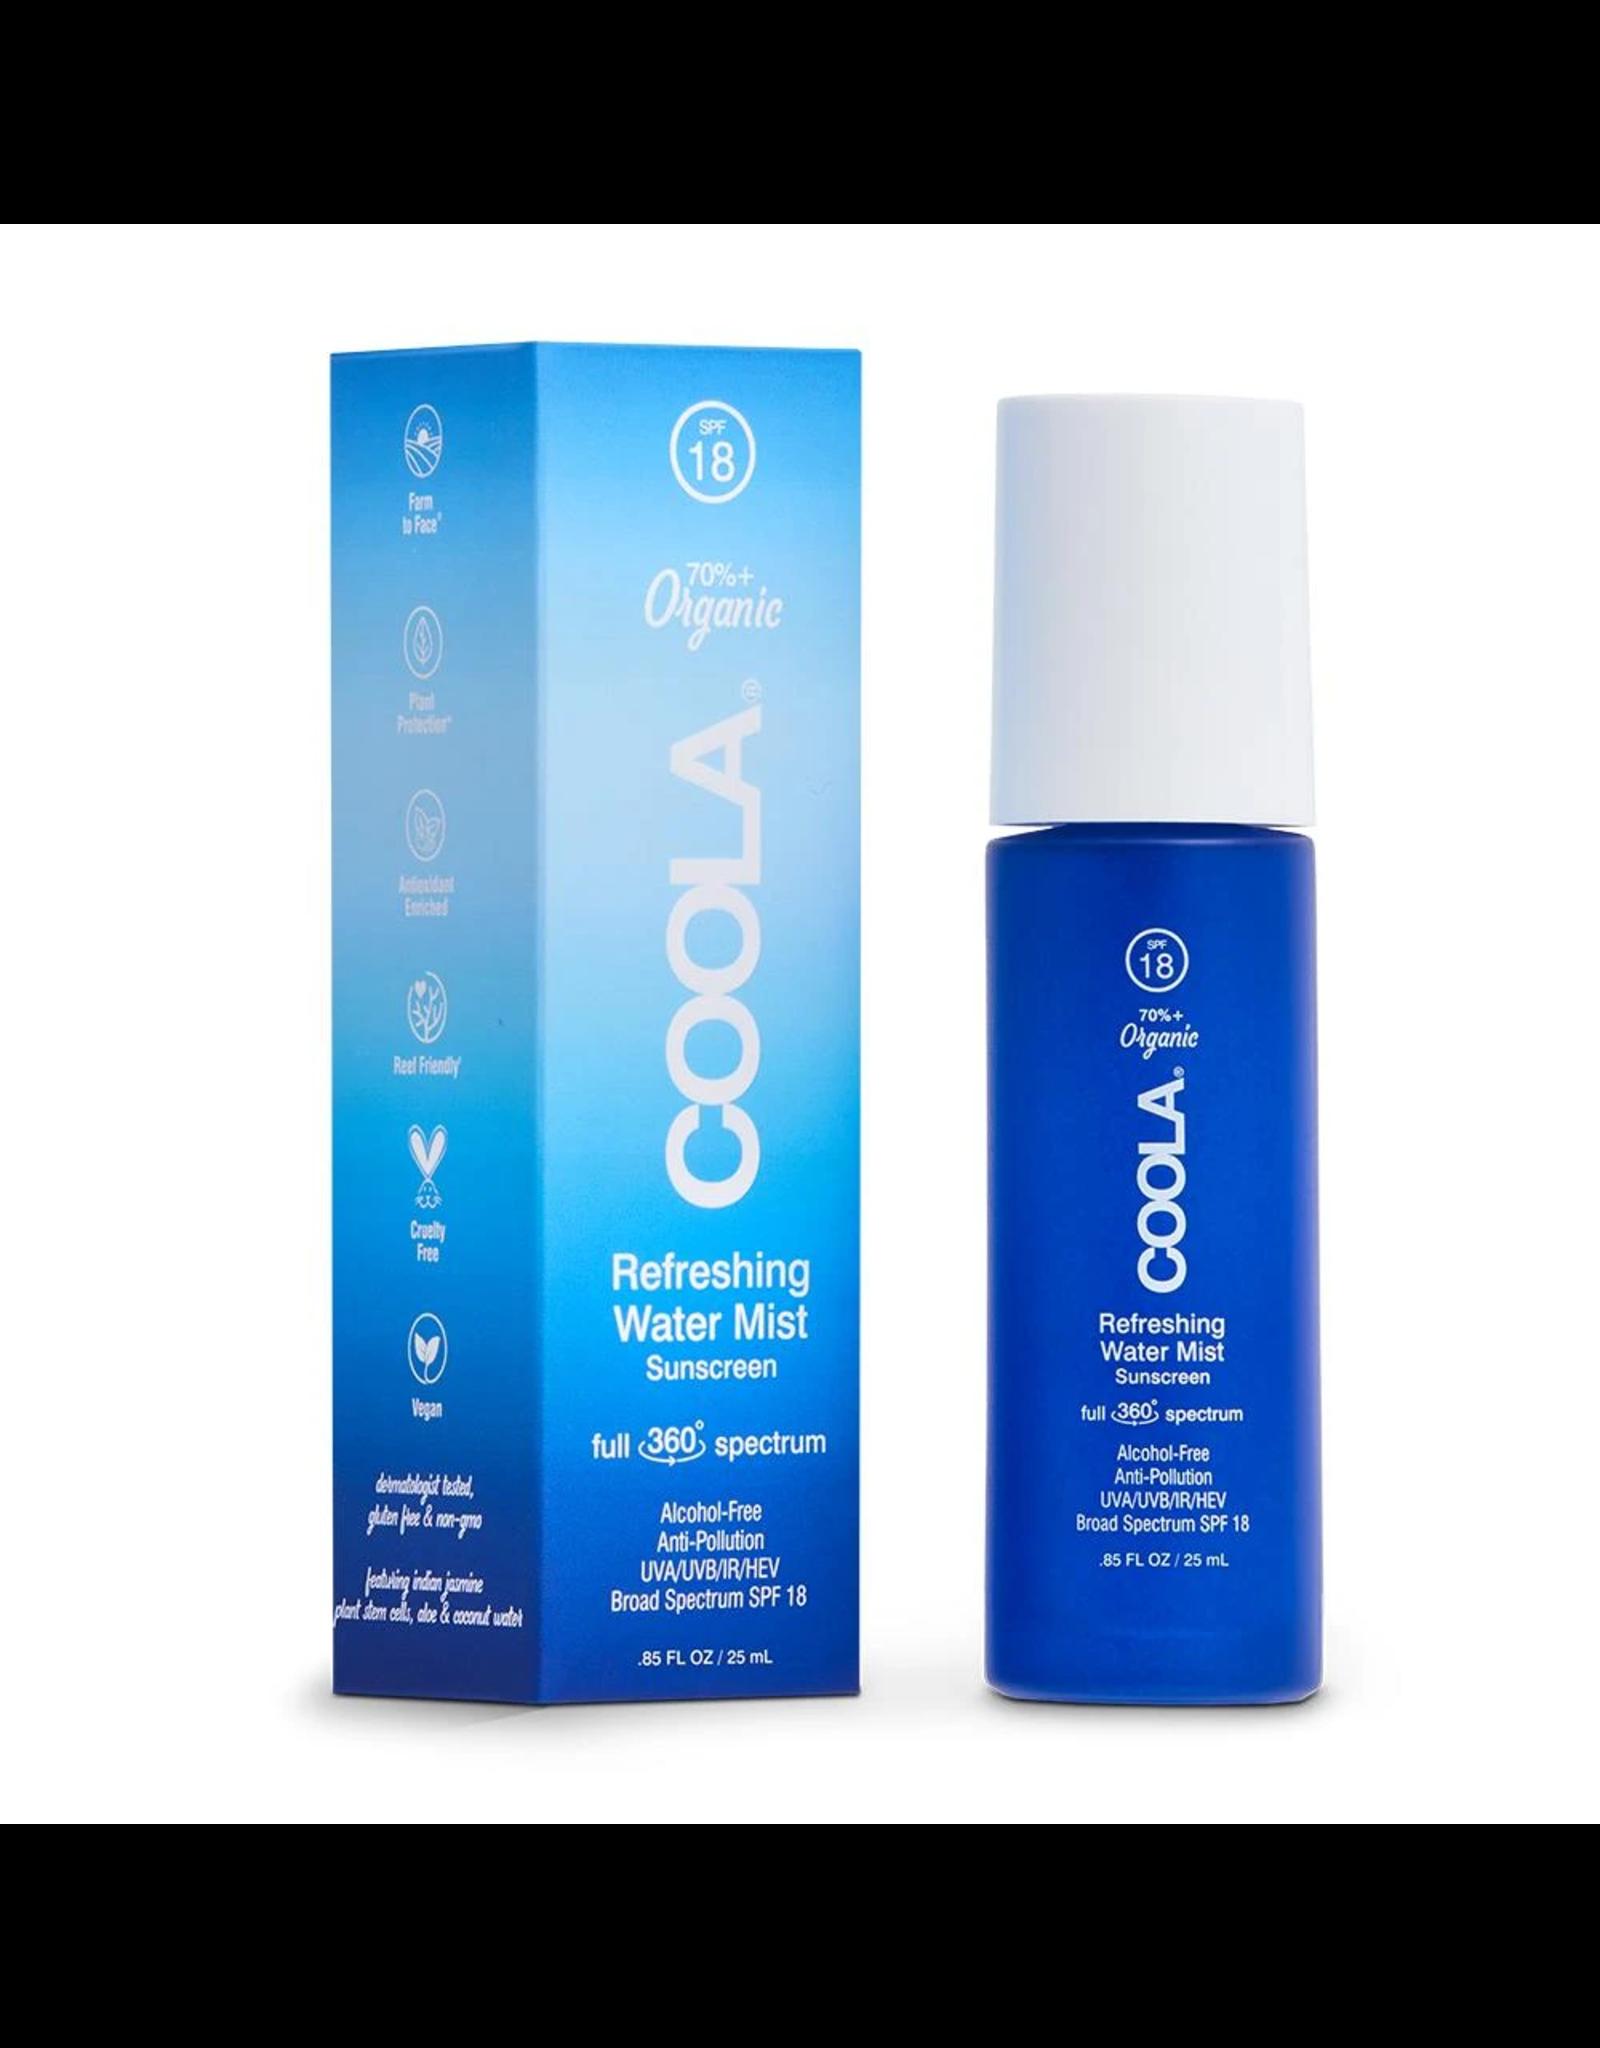 COOLA SPF 18 Full Spectrum 360 Refreshing Water Mist Organic Face Sunscreen